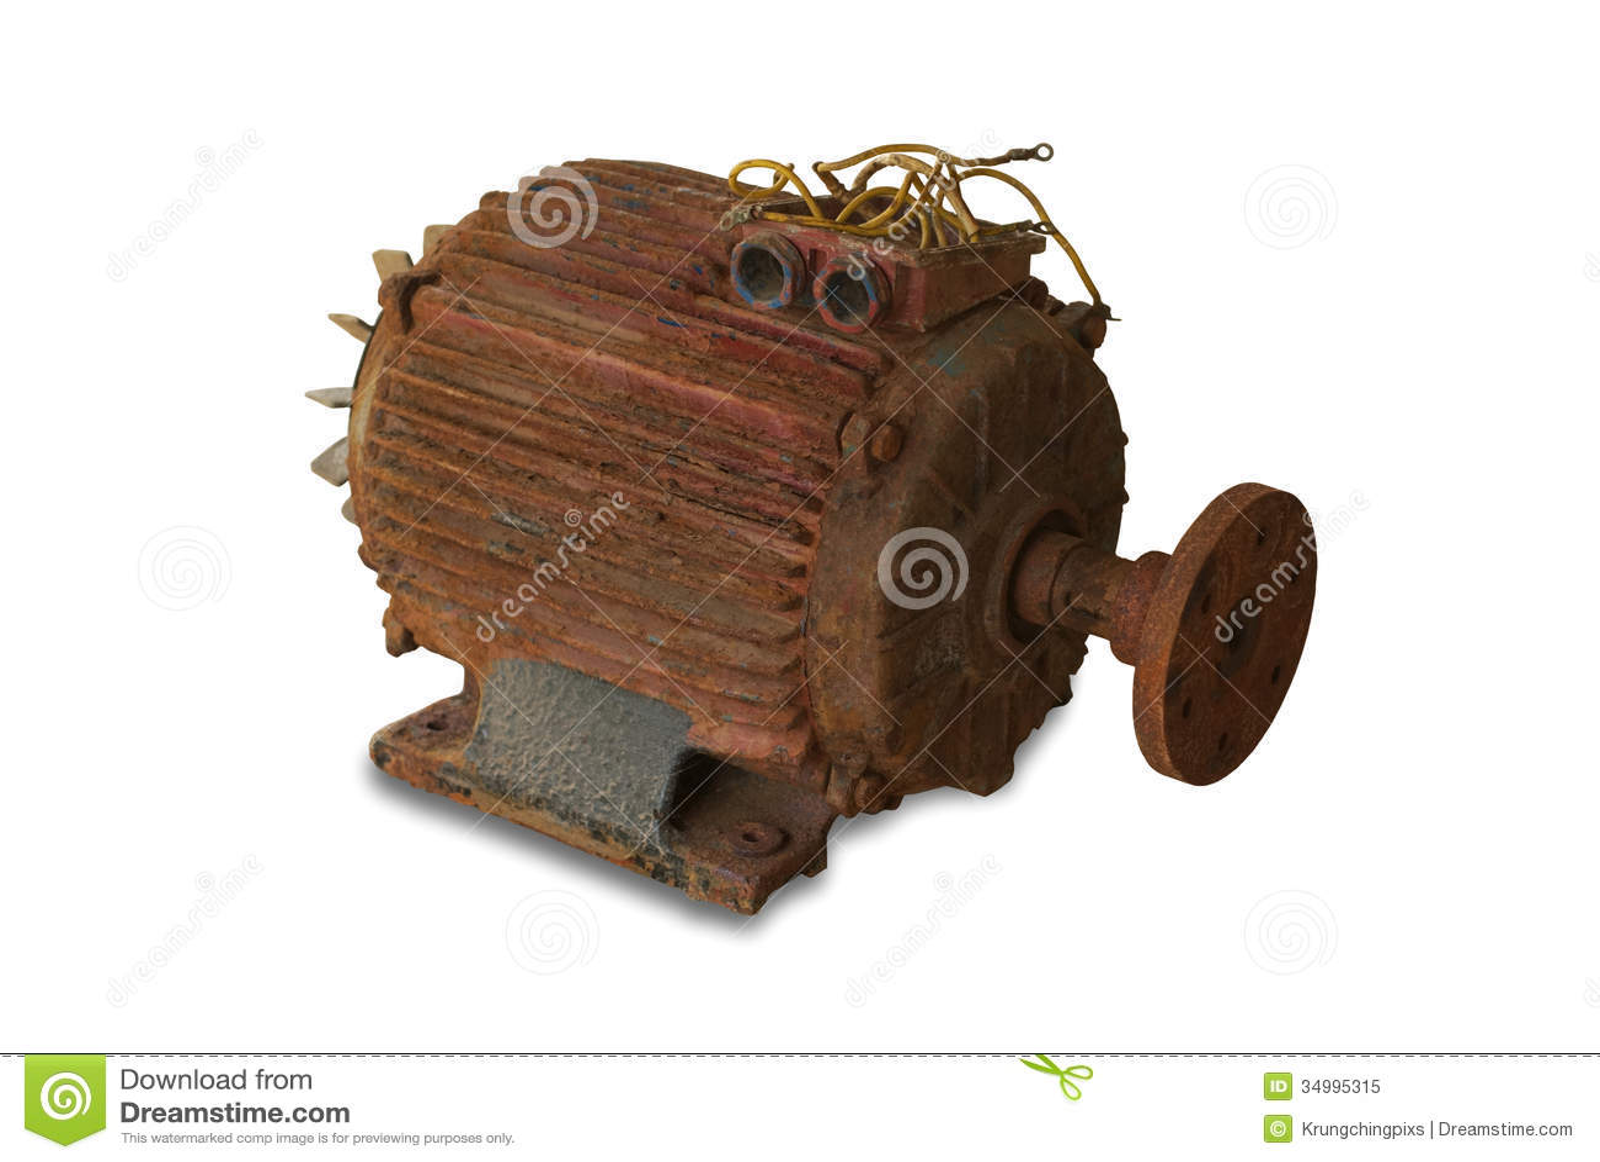 Rusty electric motor